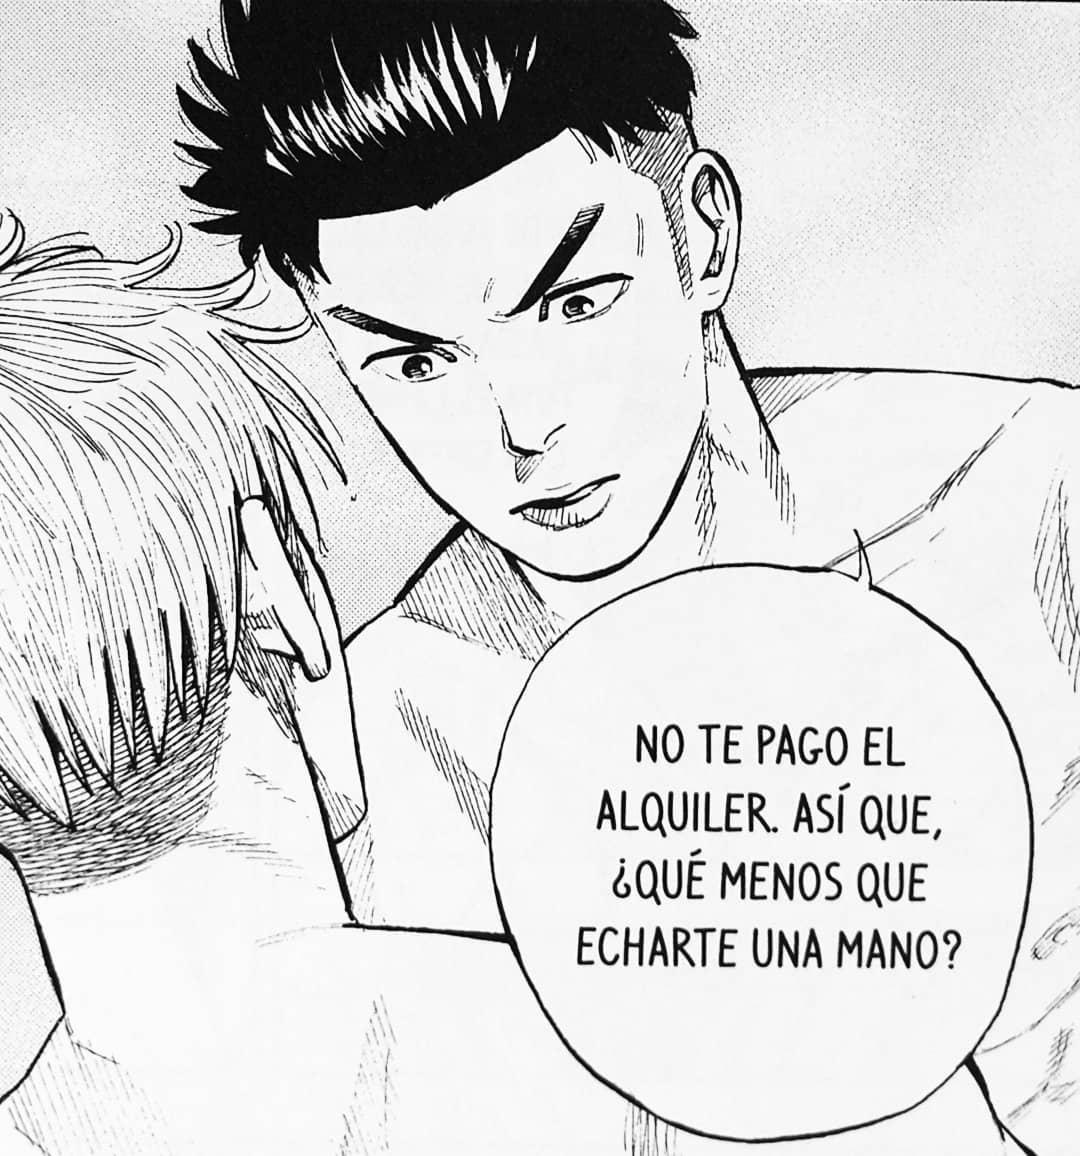 Akamatsu y Seven: Macarras in love